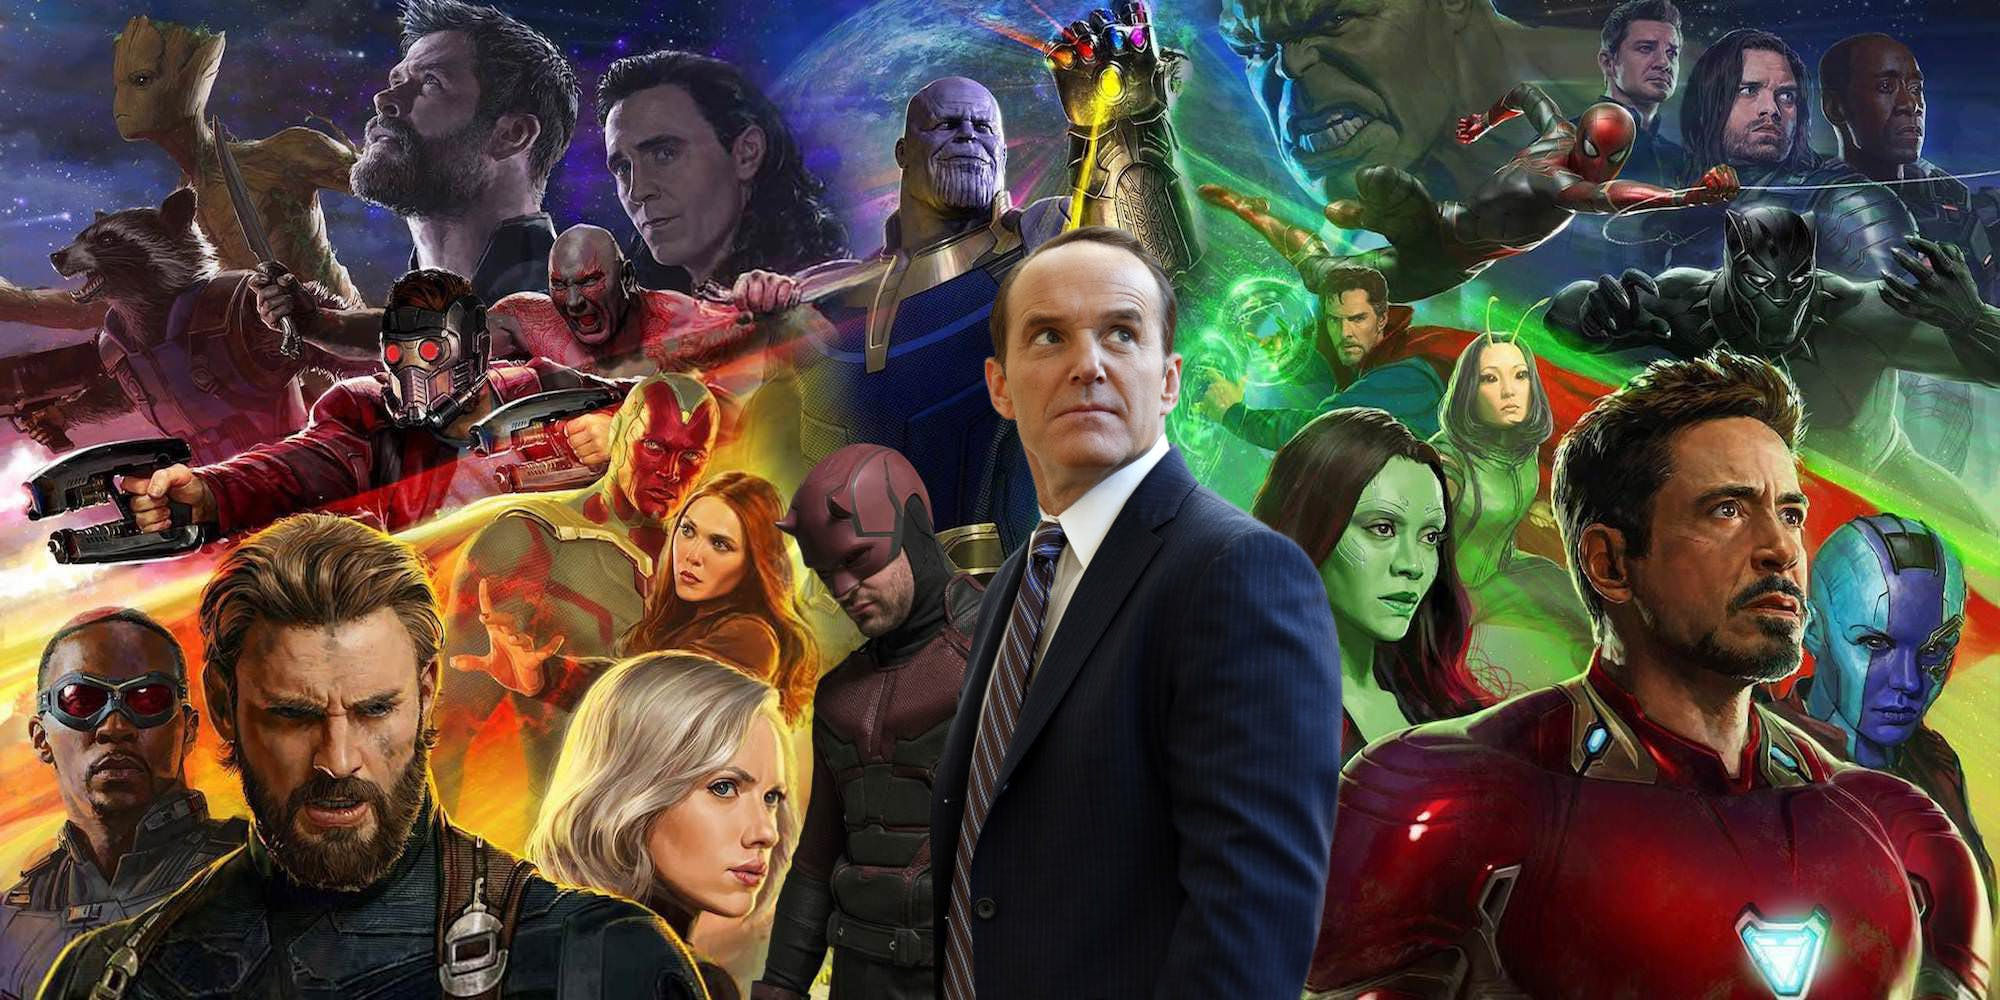 Maratona Super-Herói - Confira a cronologia do Universo Cinematográfico Marvel!